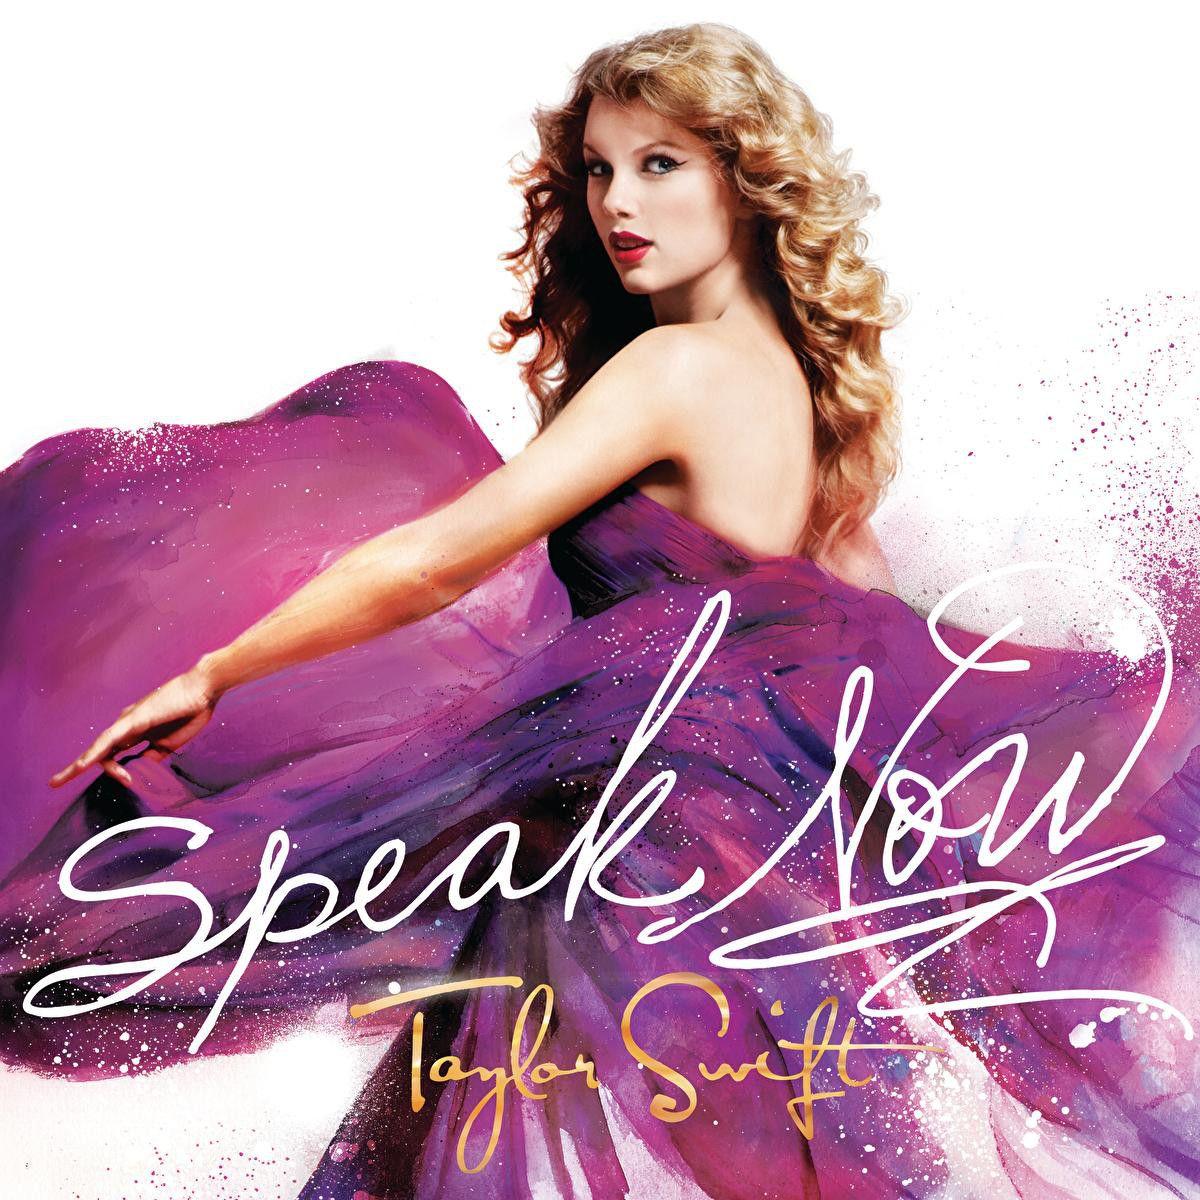 Taylor Swift - Speak Now - Album Cover